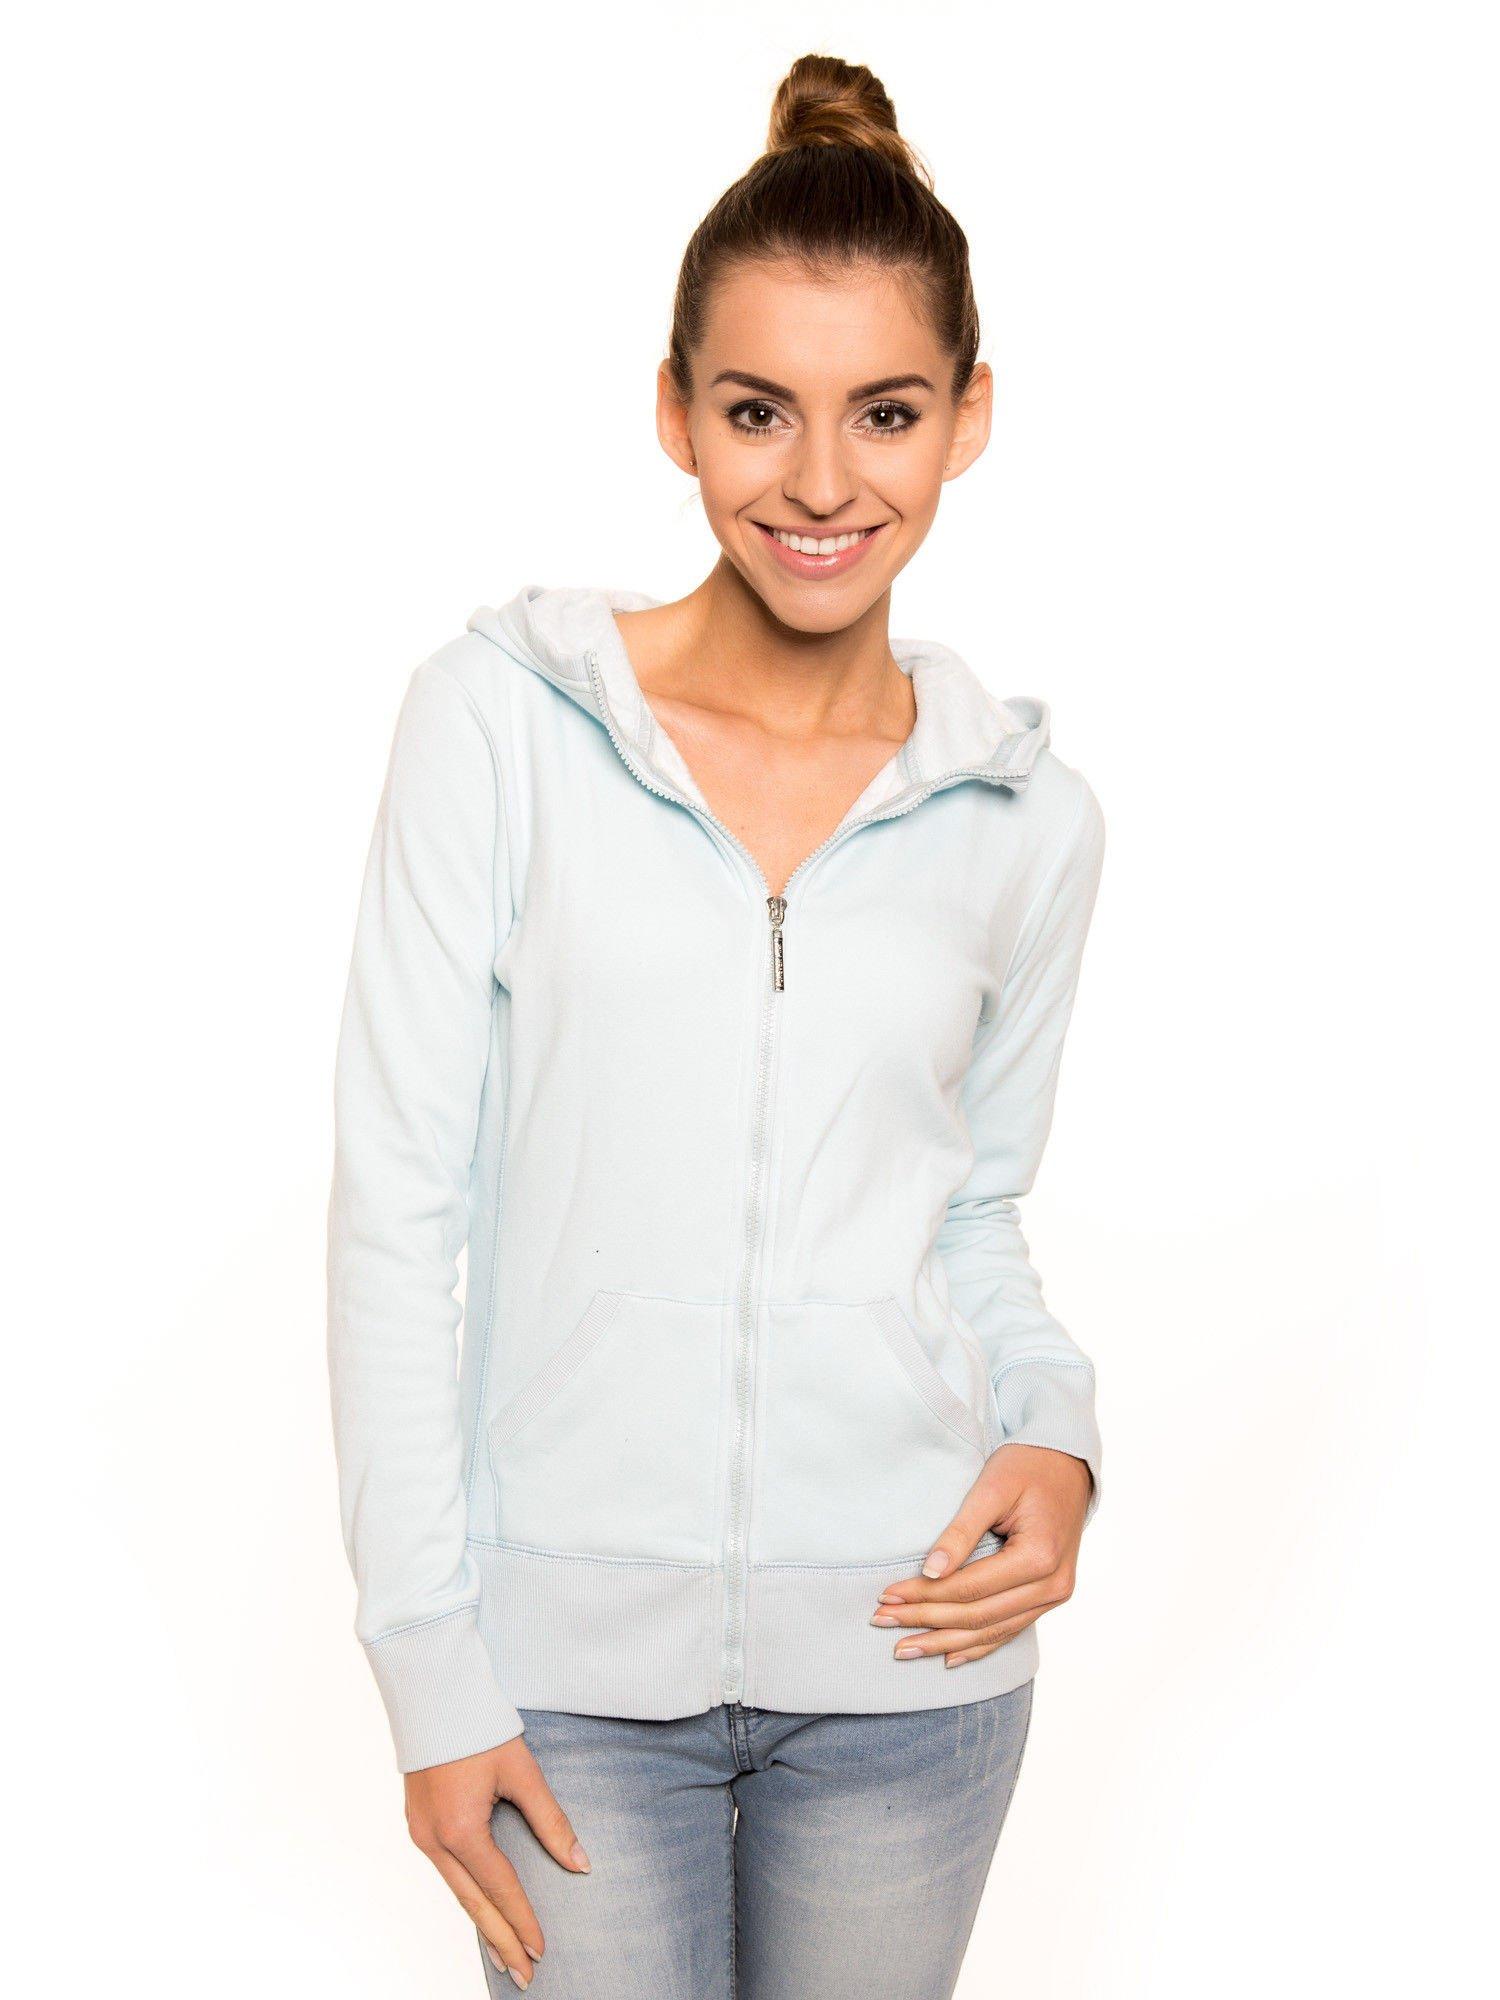 Pastelowo niebieska bluza z kapturem                                  zdj.                                  1